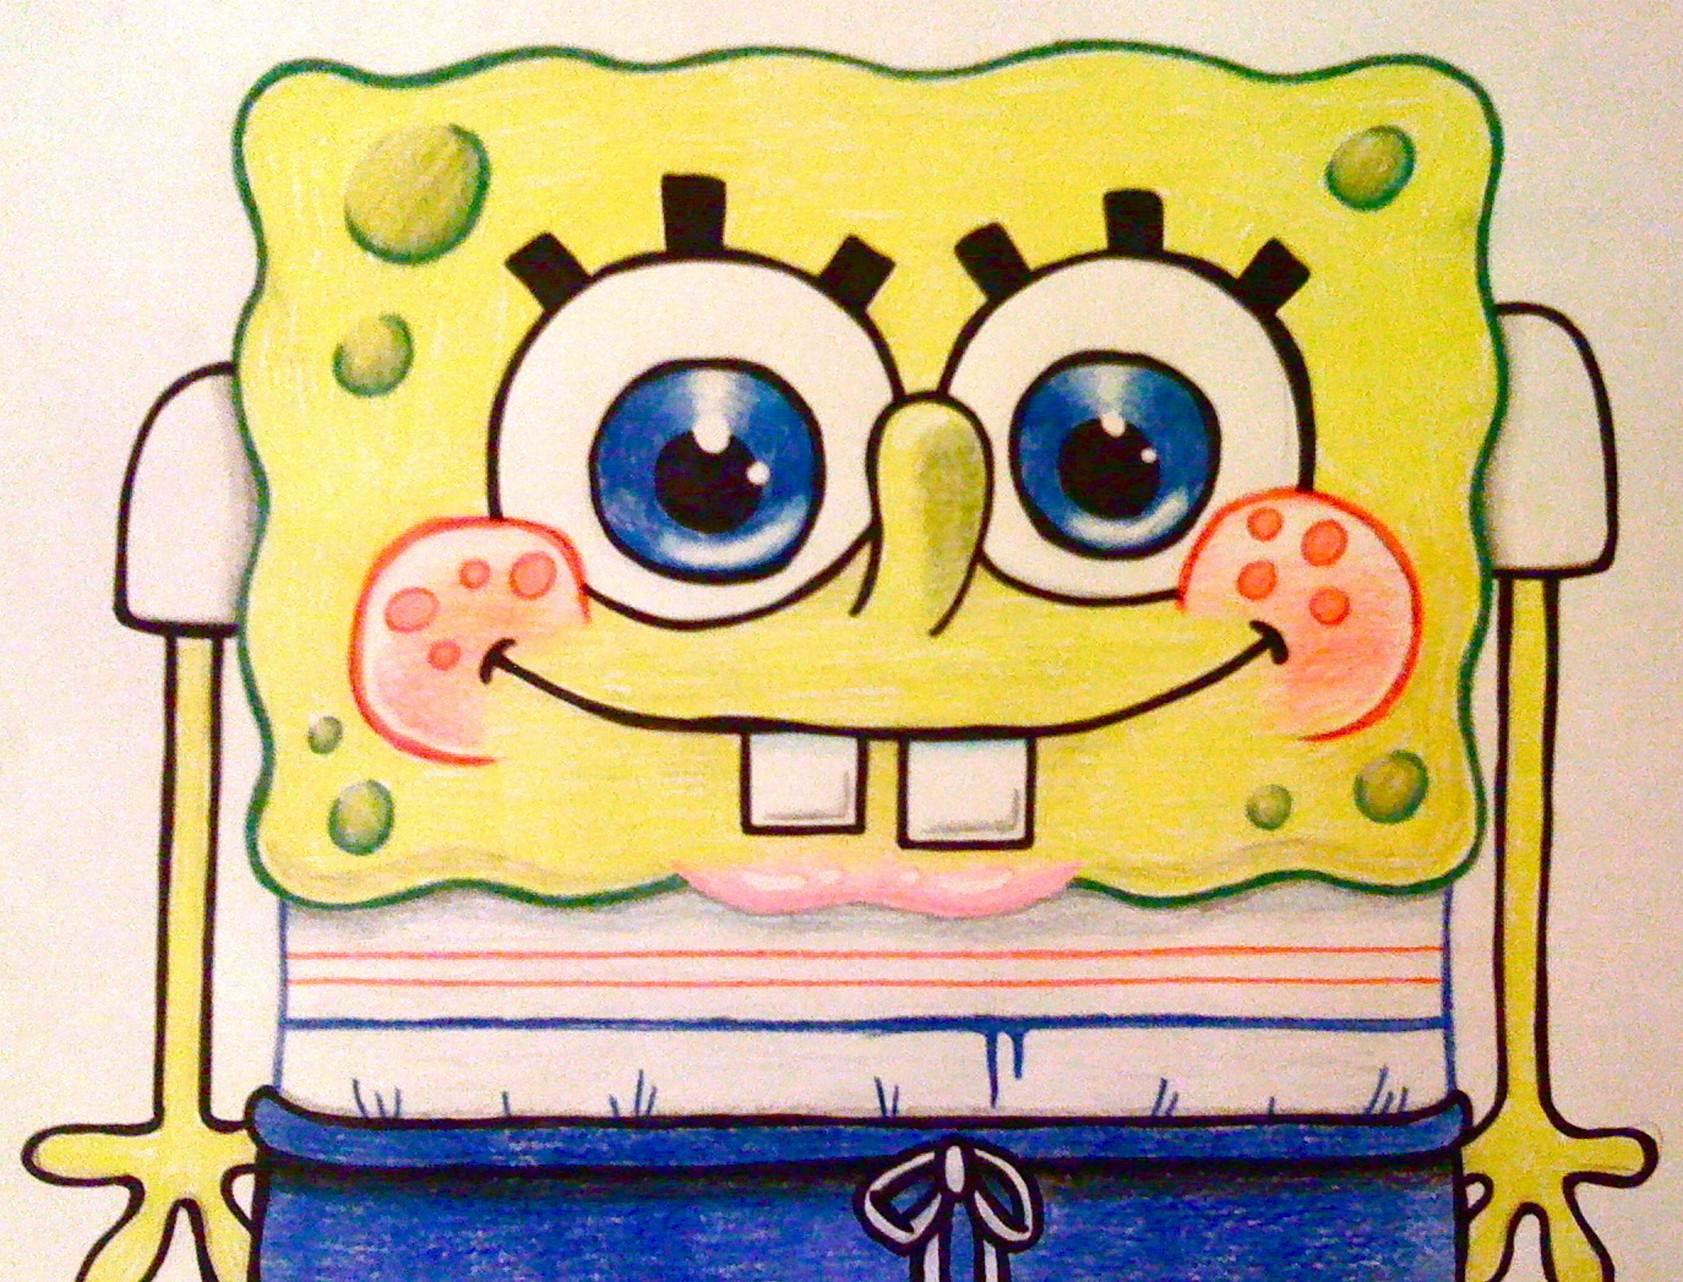 Drawn rainbow high resolution Images Pinterest in Spongebob Wallpaper